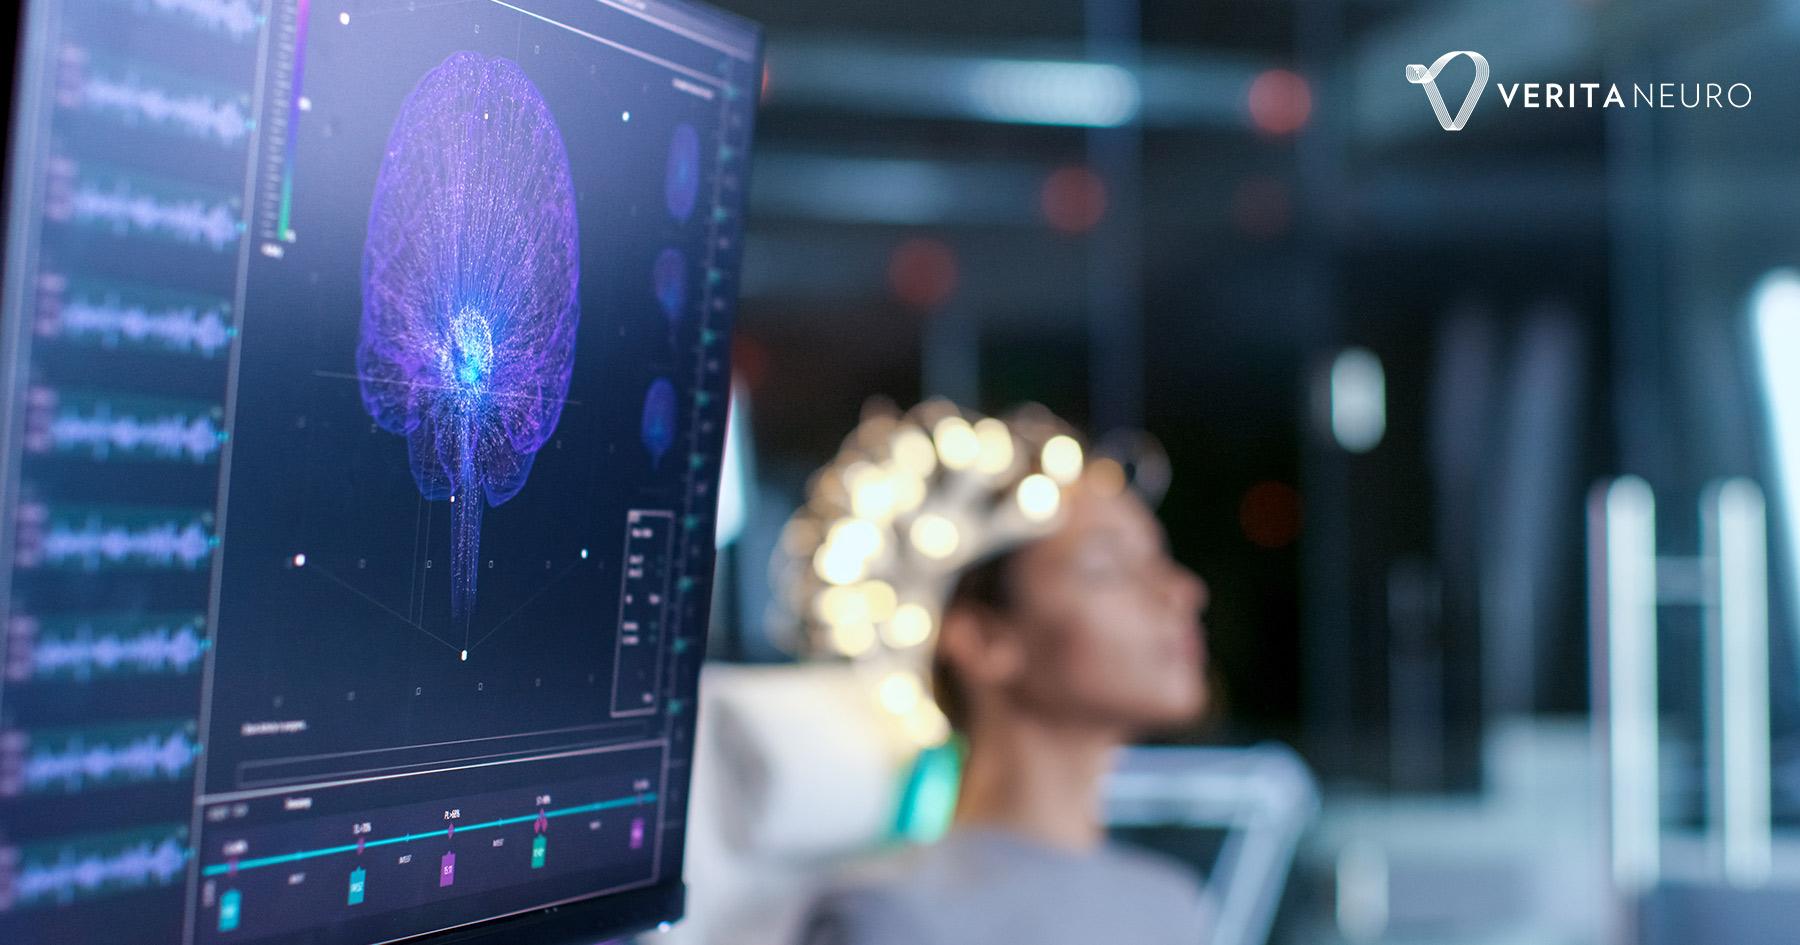 US Dept. of Defense launches exciting new SCI treatment program - Verita Neuro